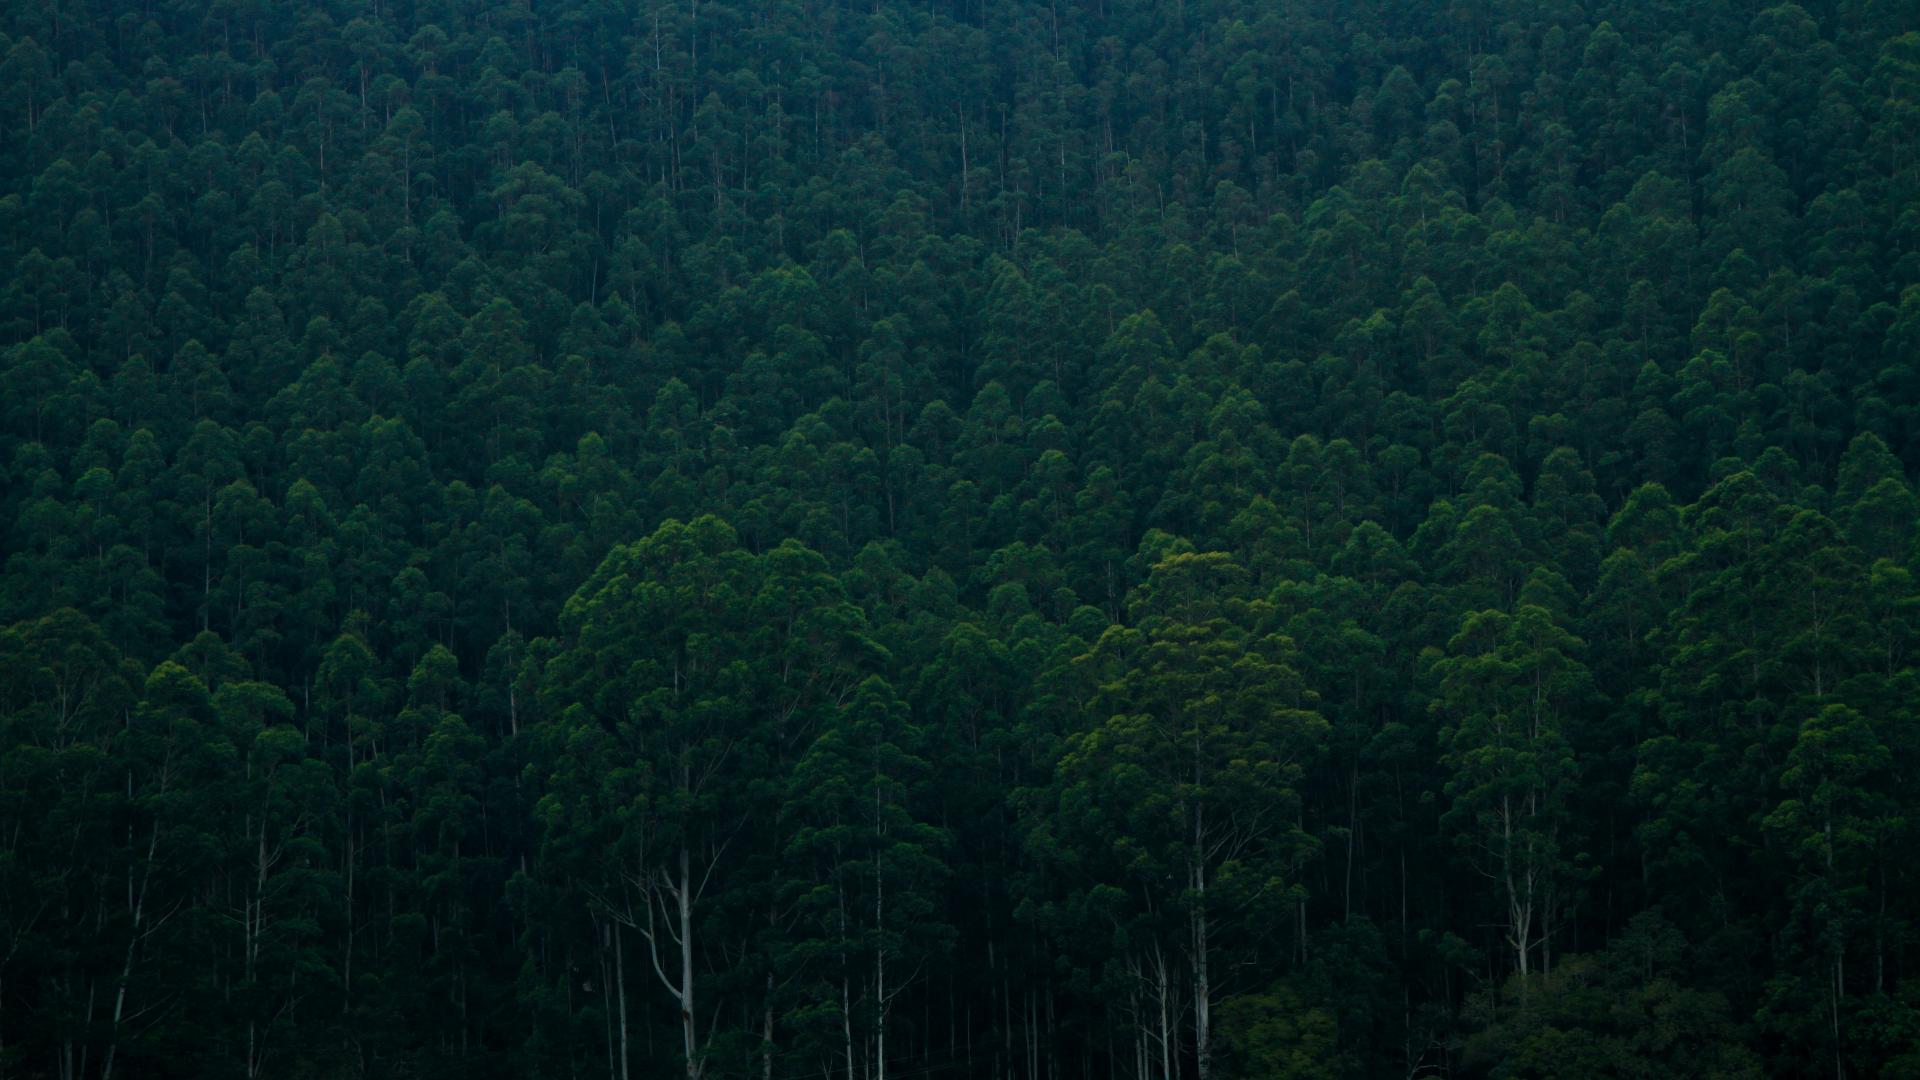 General 1920x1080 nature trees forest dark rainforest India